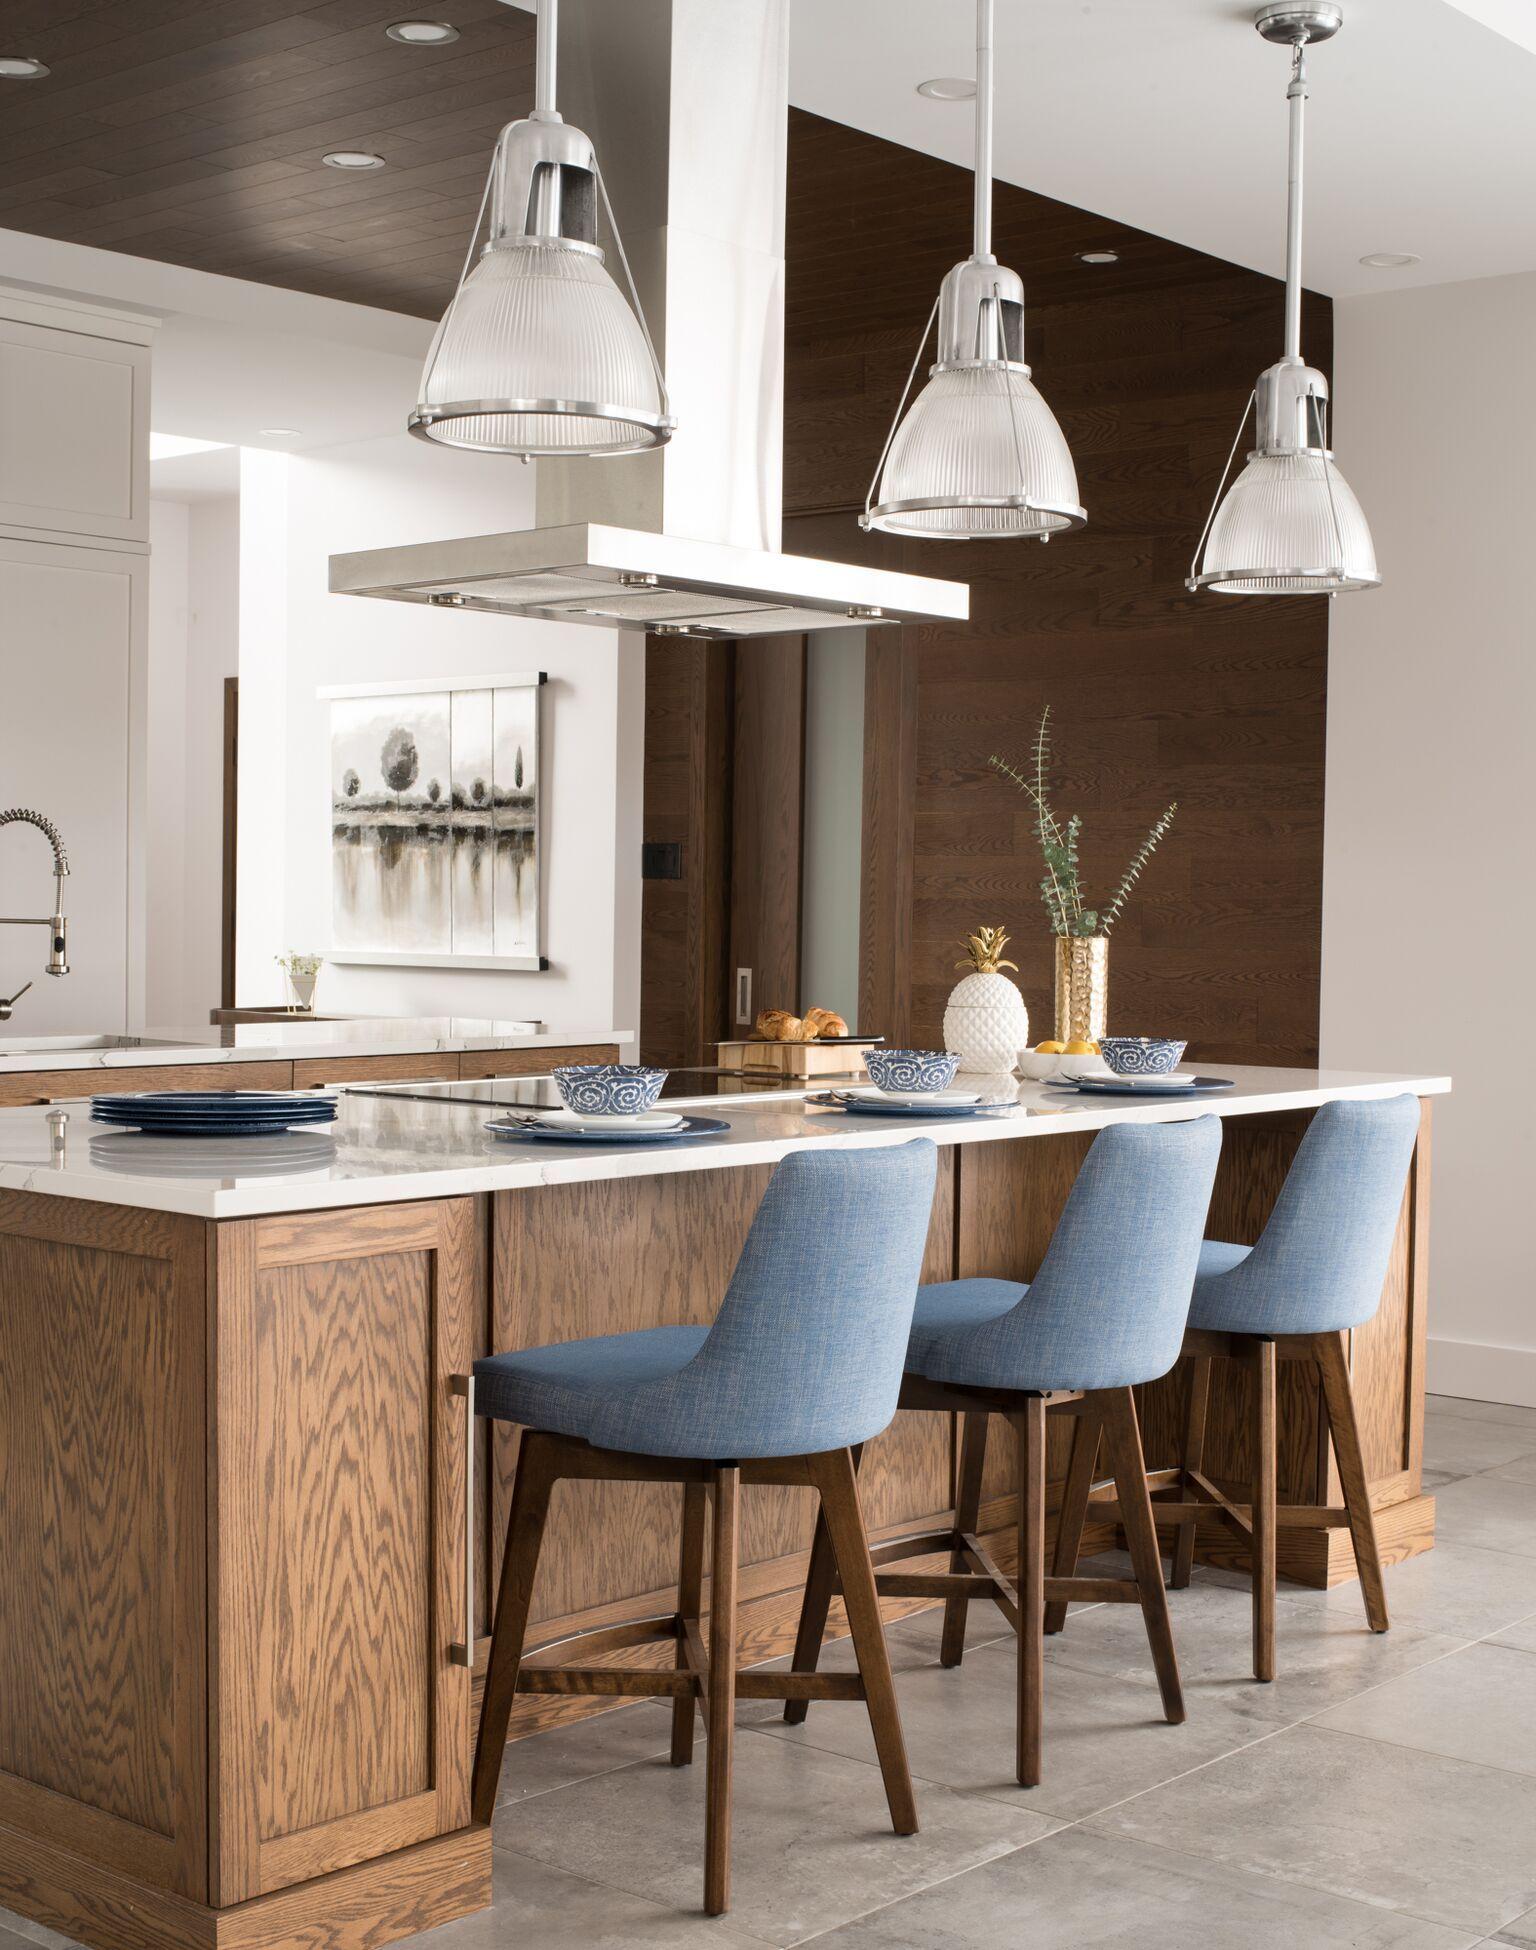 Modern Breakfast Counter By Canadel Breakfast Bar Chairs